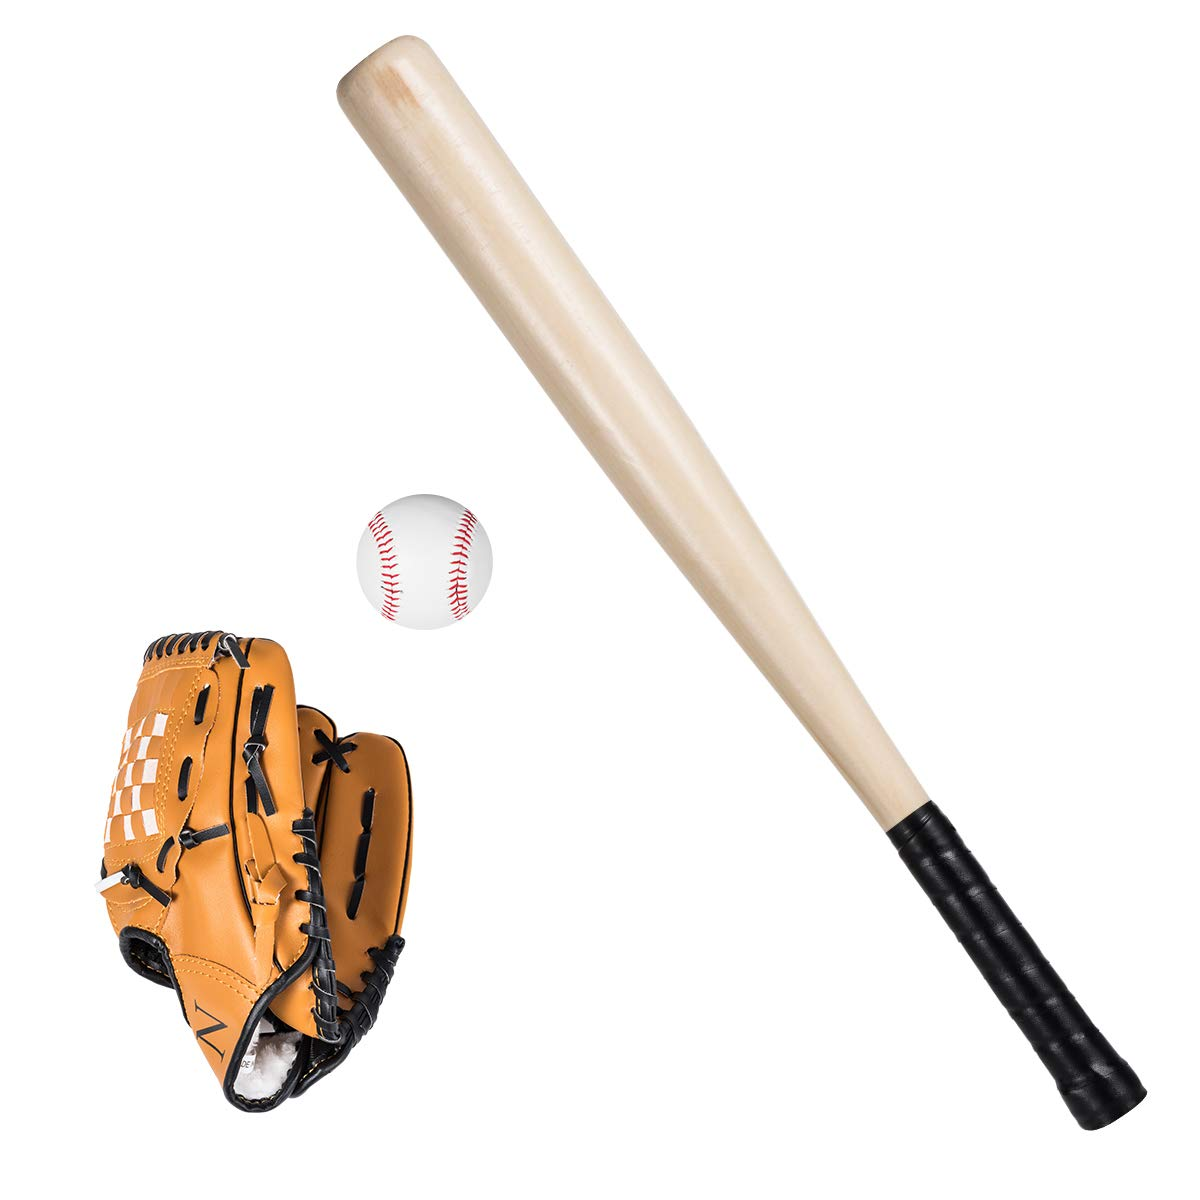 TOYSHARING Wooden Baseball Bat Anti Skid Baseball Glove Durable Baseball Safety Sports Toy Set for Kids Children Toddler Boy Gifts by TOYSHARING